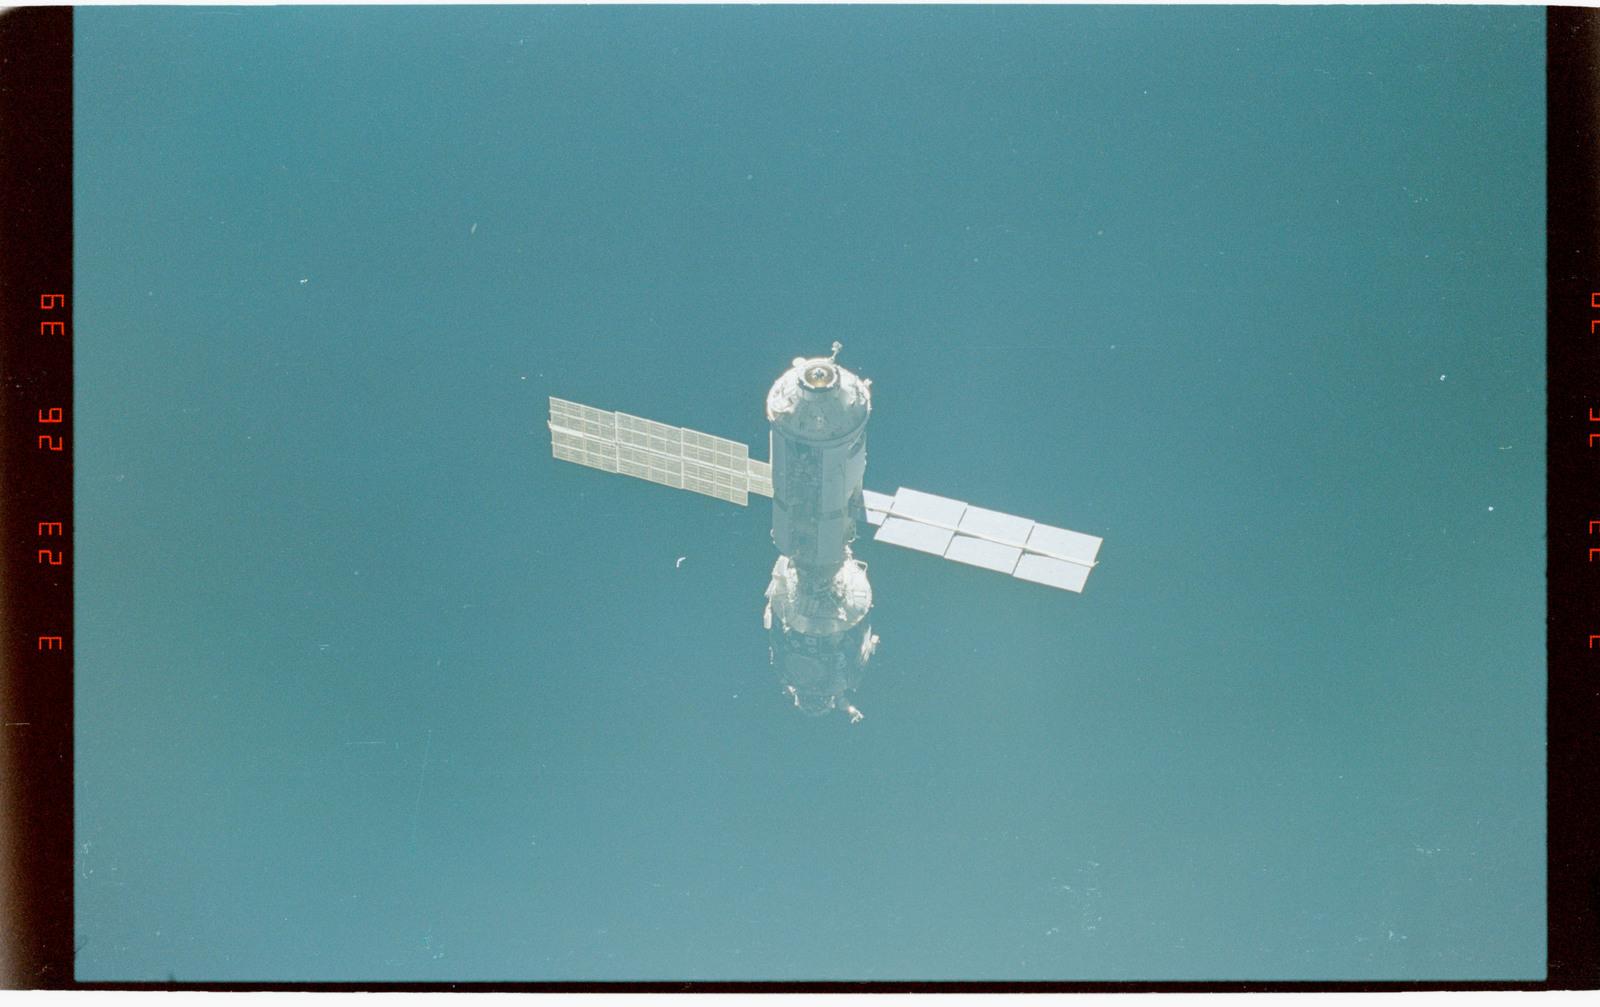 STS096-411-018 - STS-096 - ISS views taken during flyaround